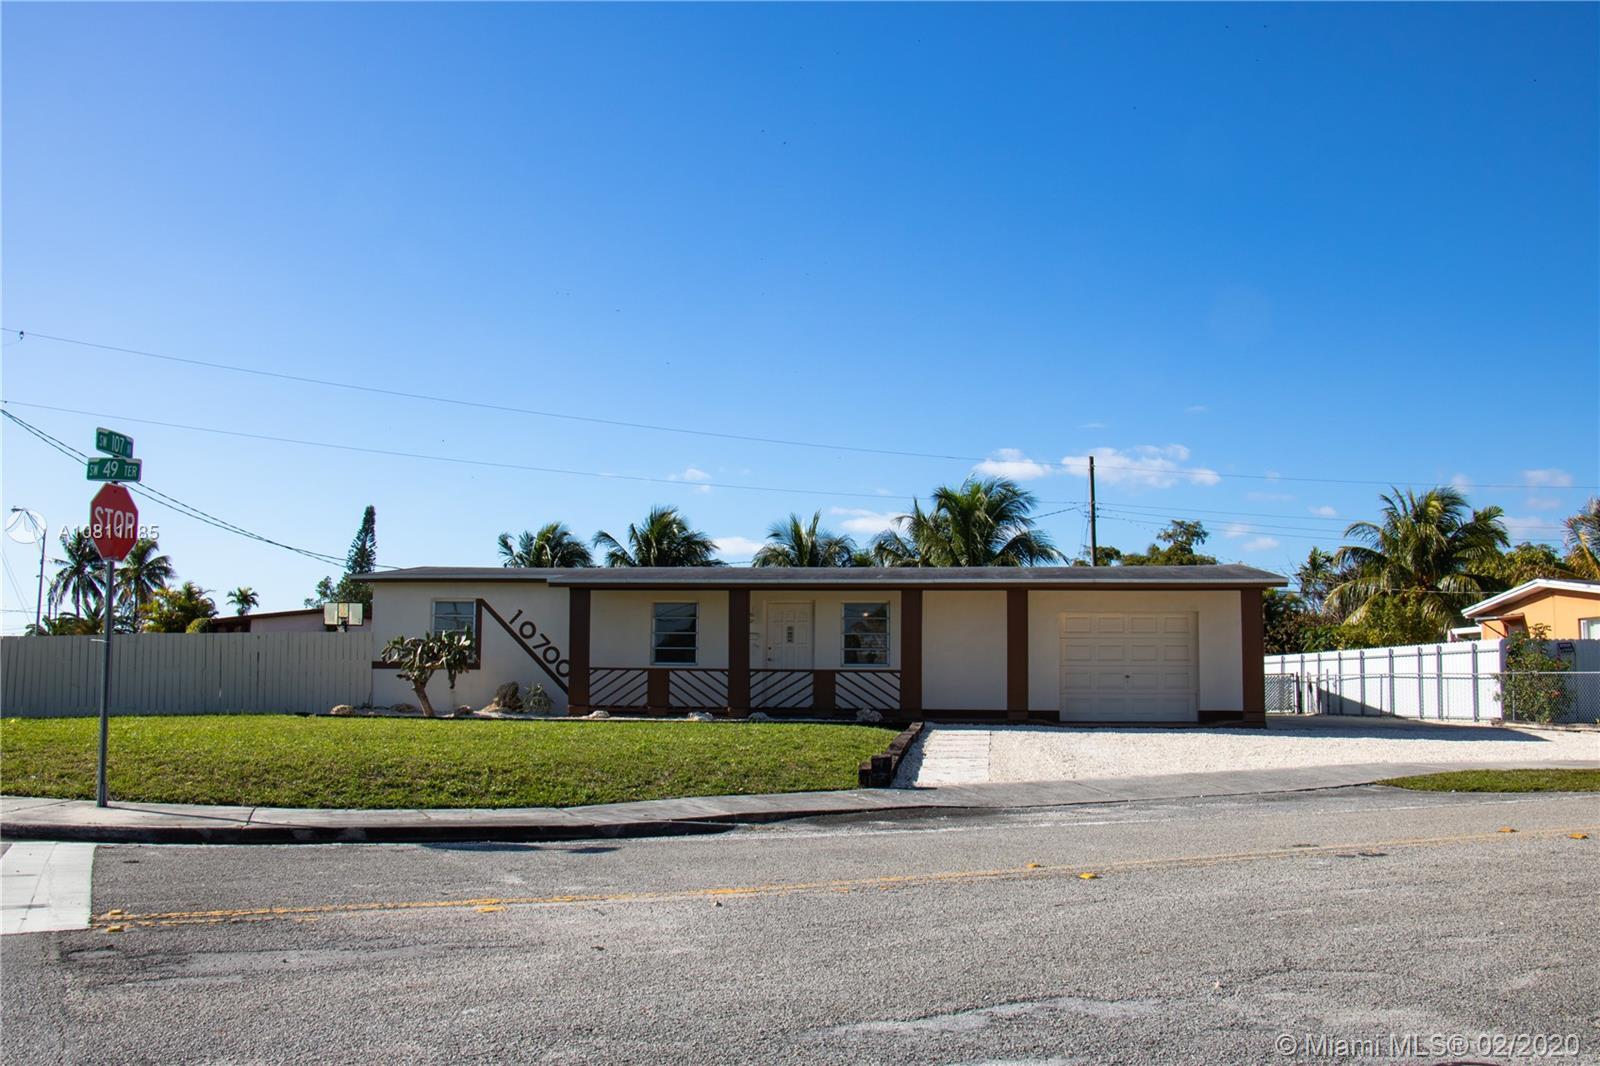 10700 SW 49th Ter - Miami, Florida